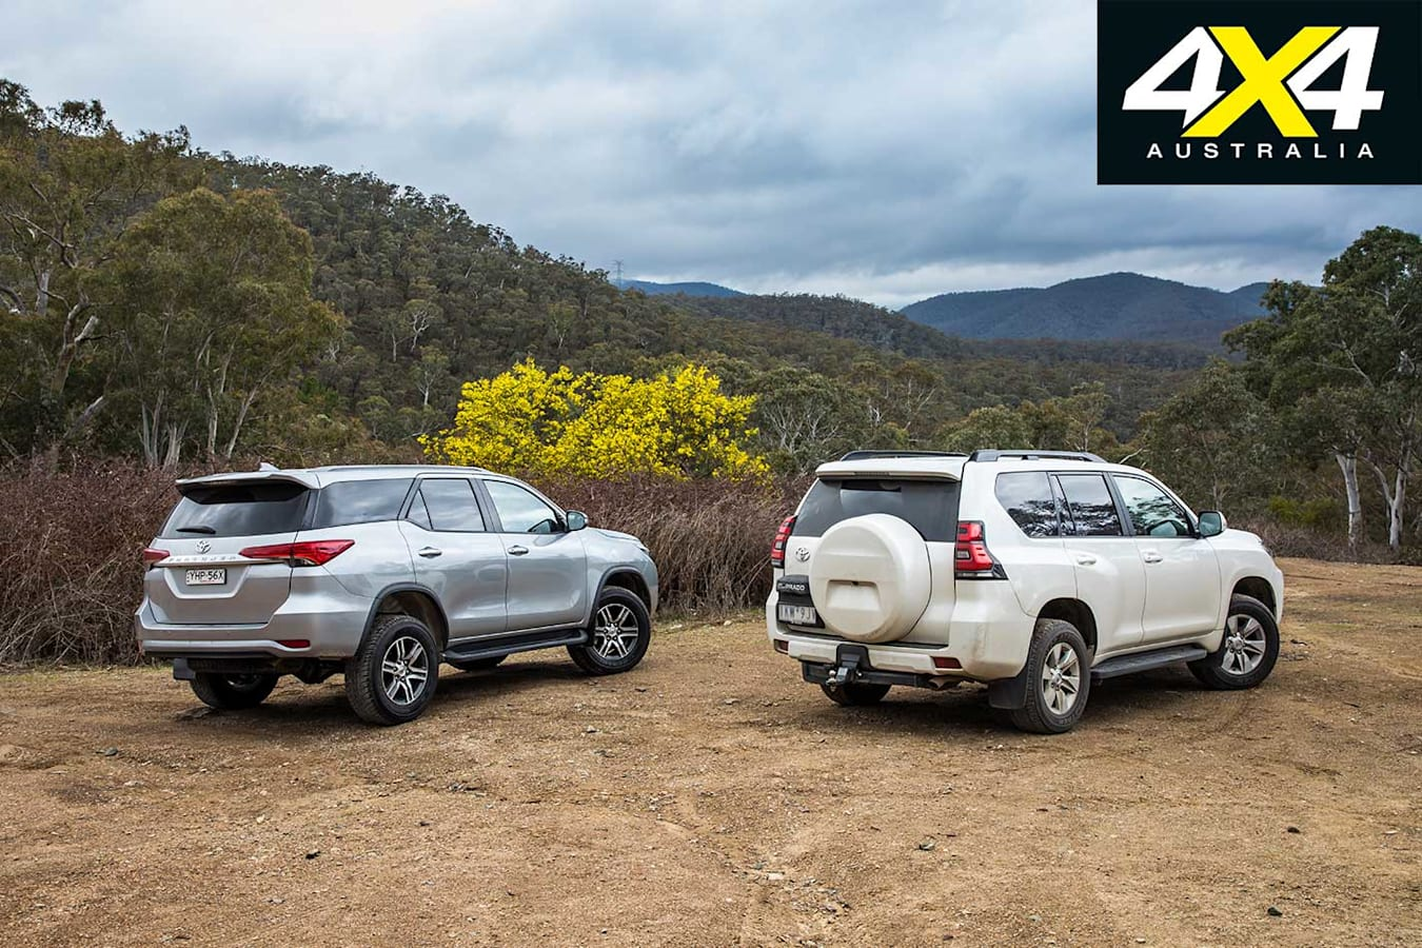 2018 Toyota Prado Vs Toyota Fortuner Comparison Rear Jpg